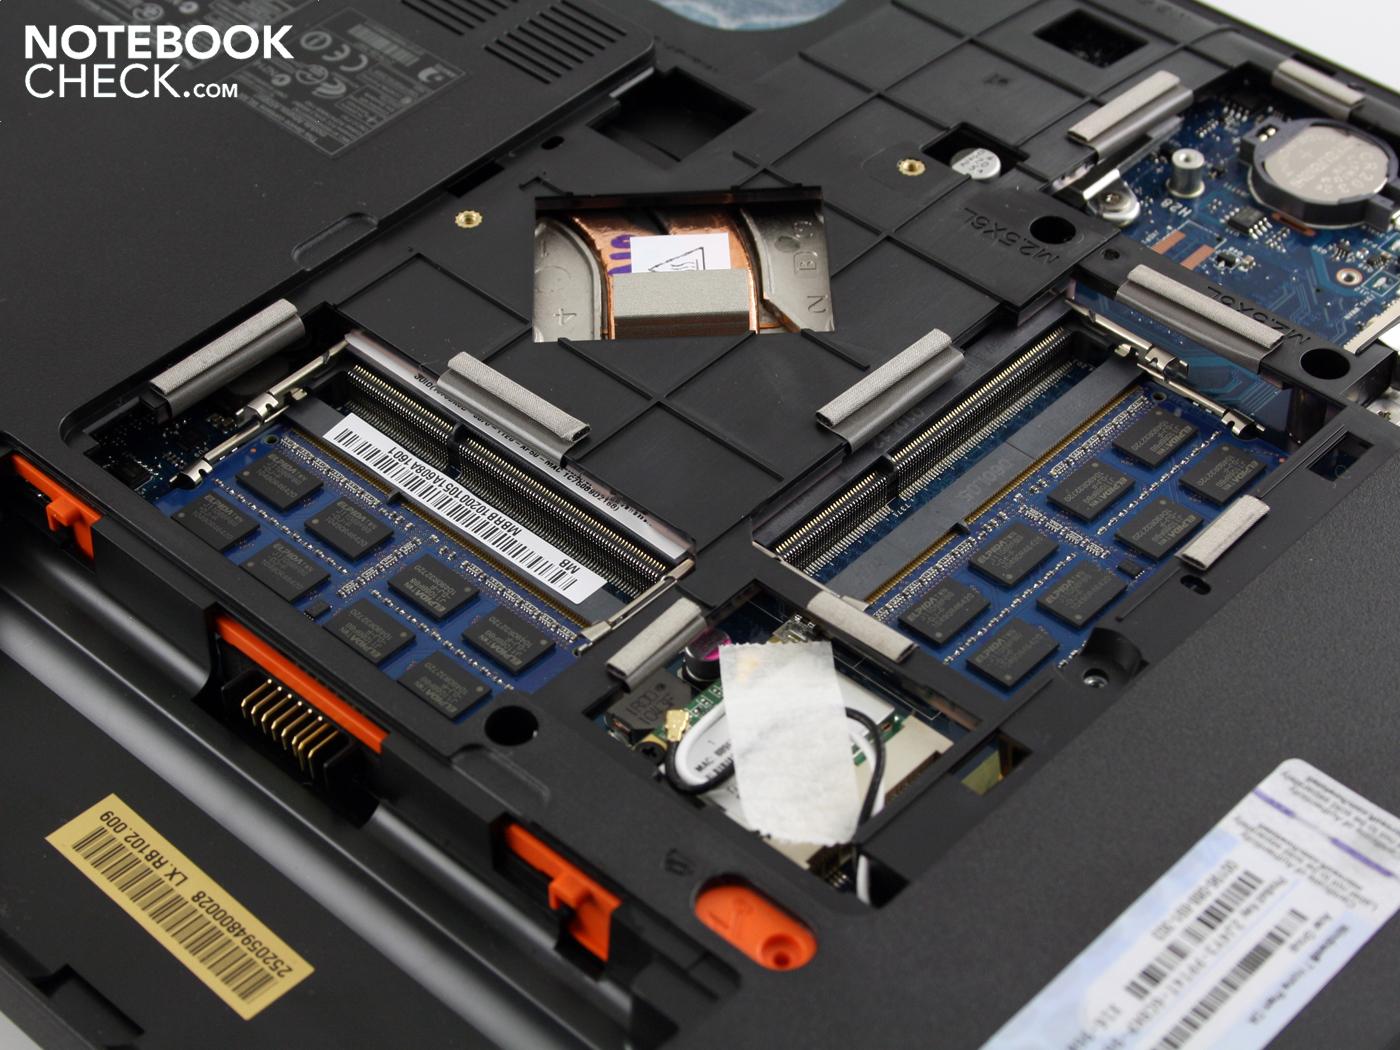 Review Acer Aspire 7750g Notebook Notebookcheck Net Reviews